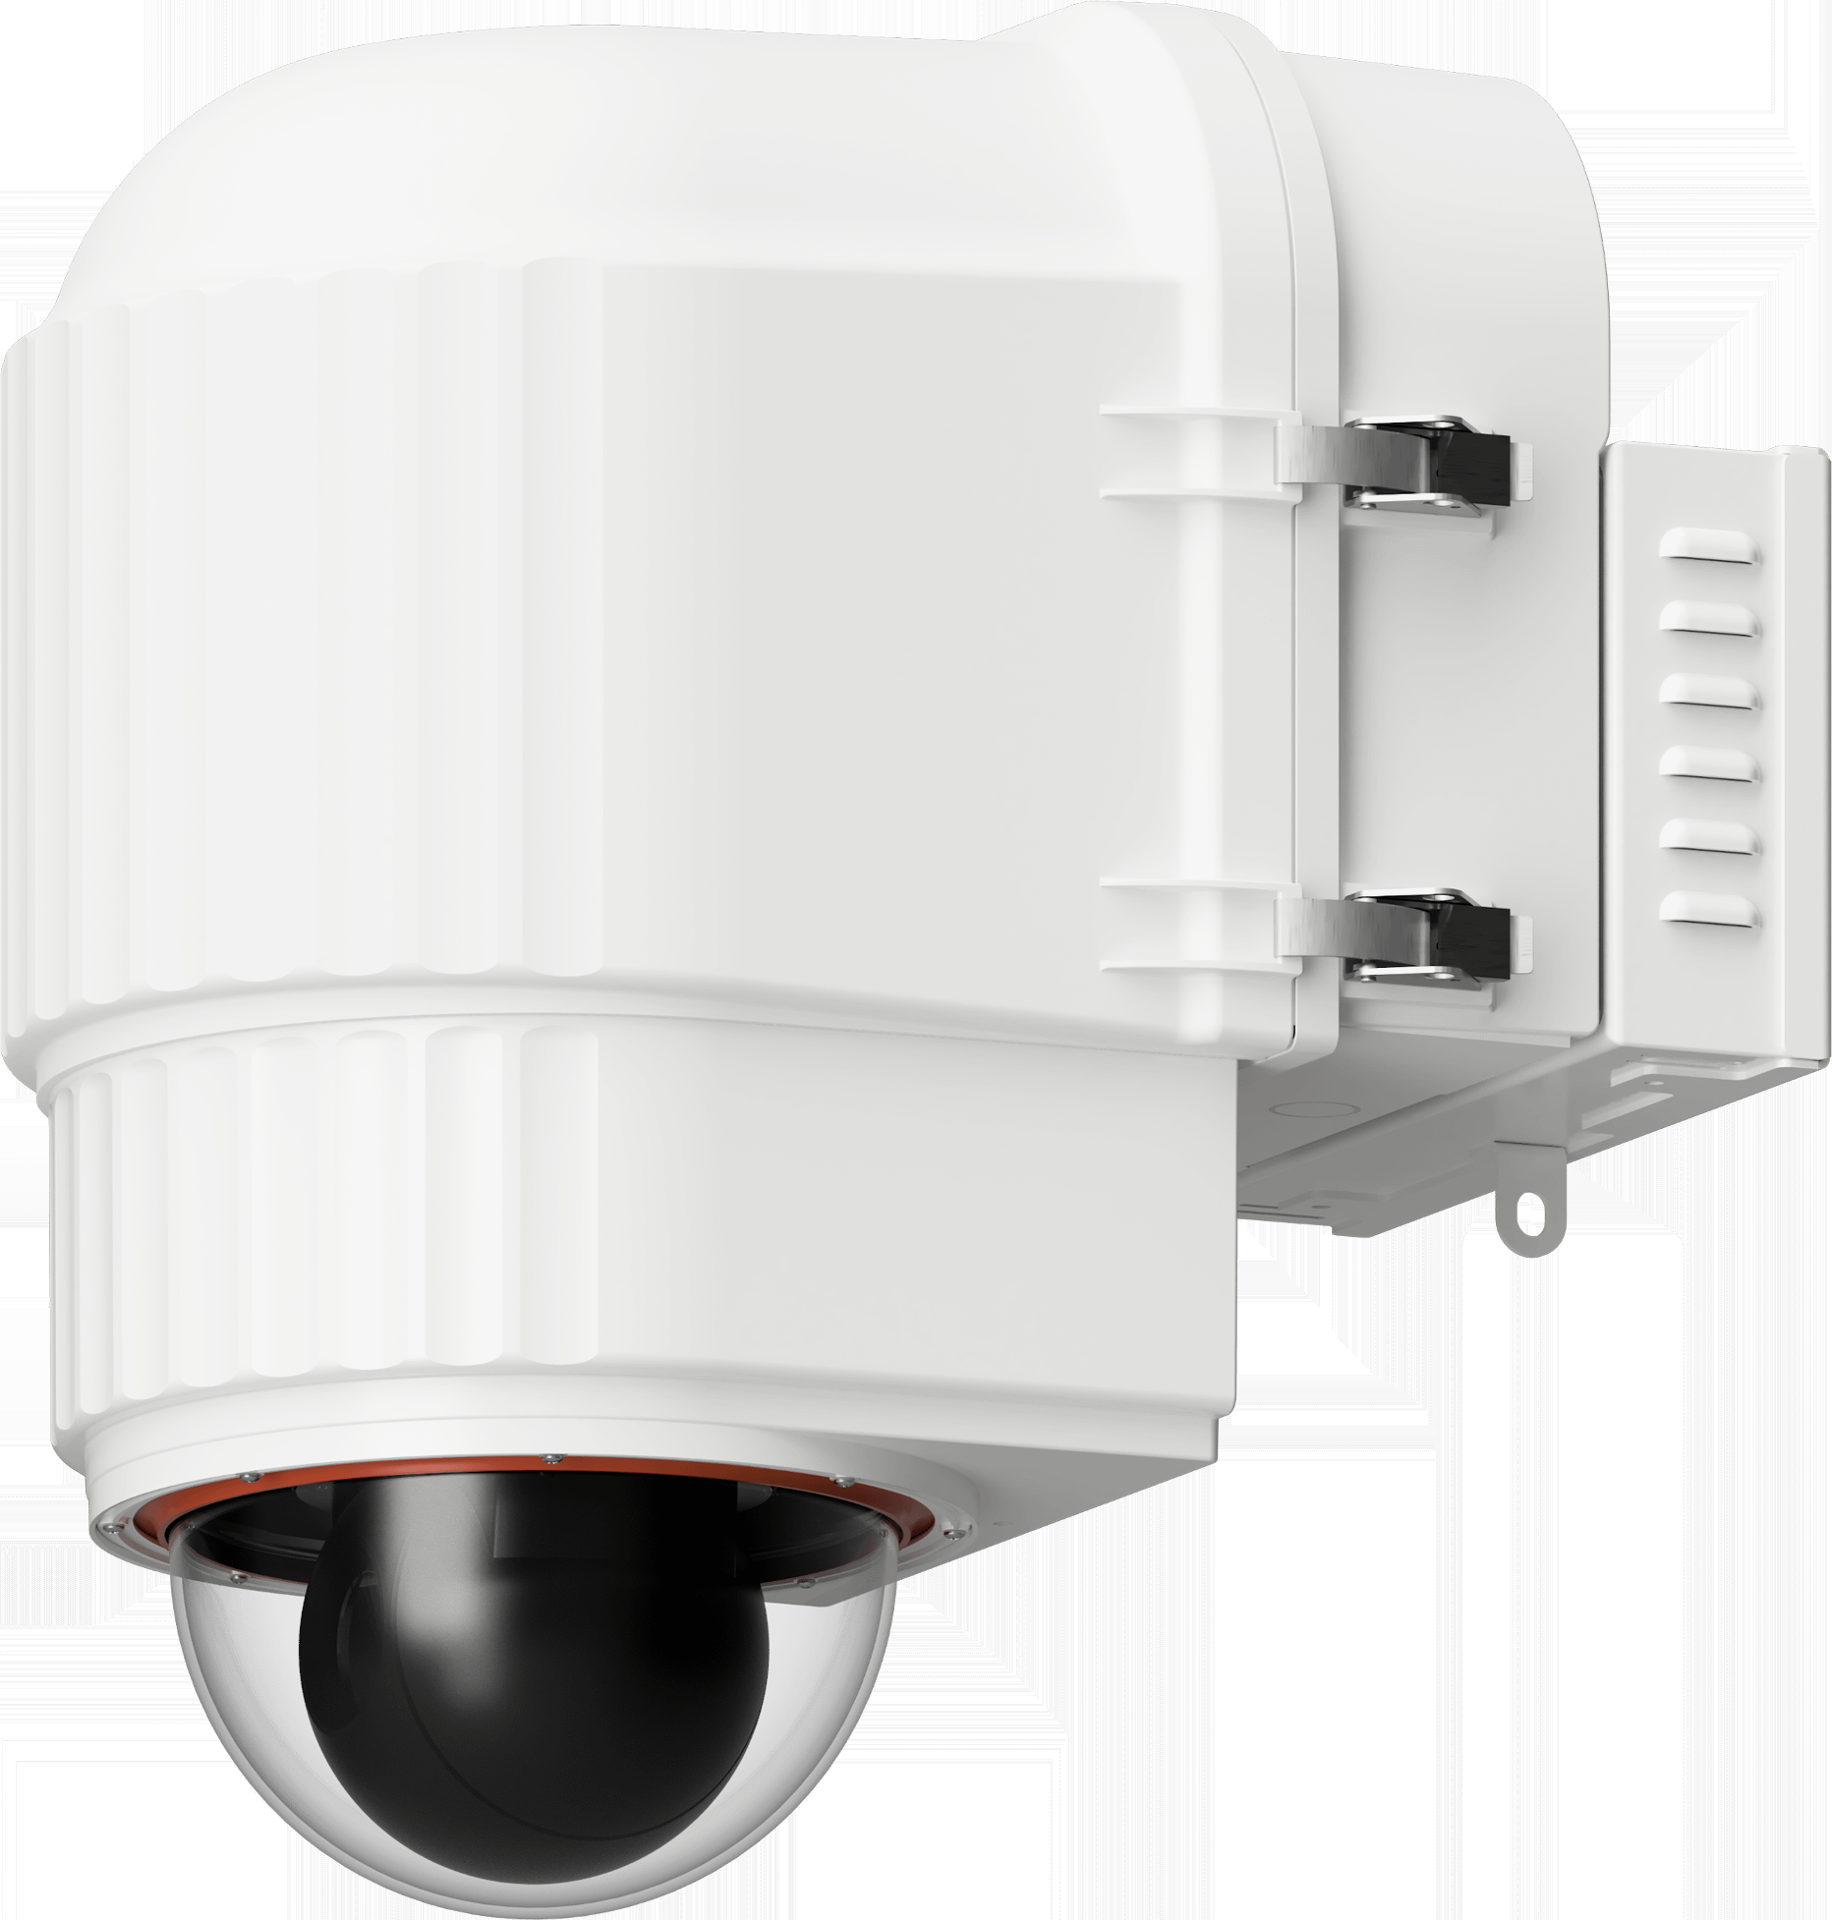 x stream designs xcold ev outdoor climate controlled ptz camera enclosure se